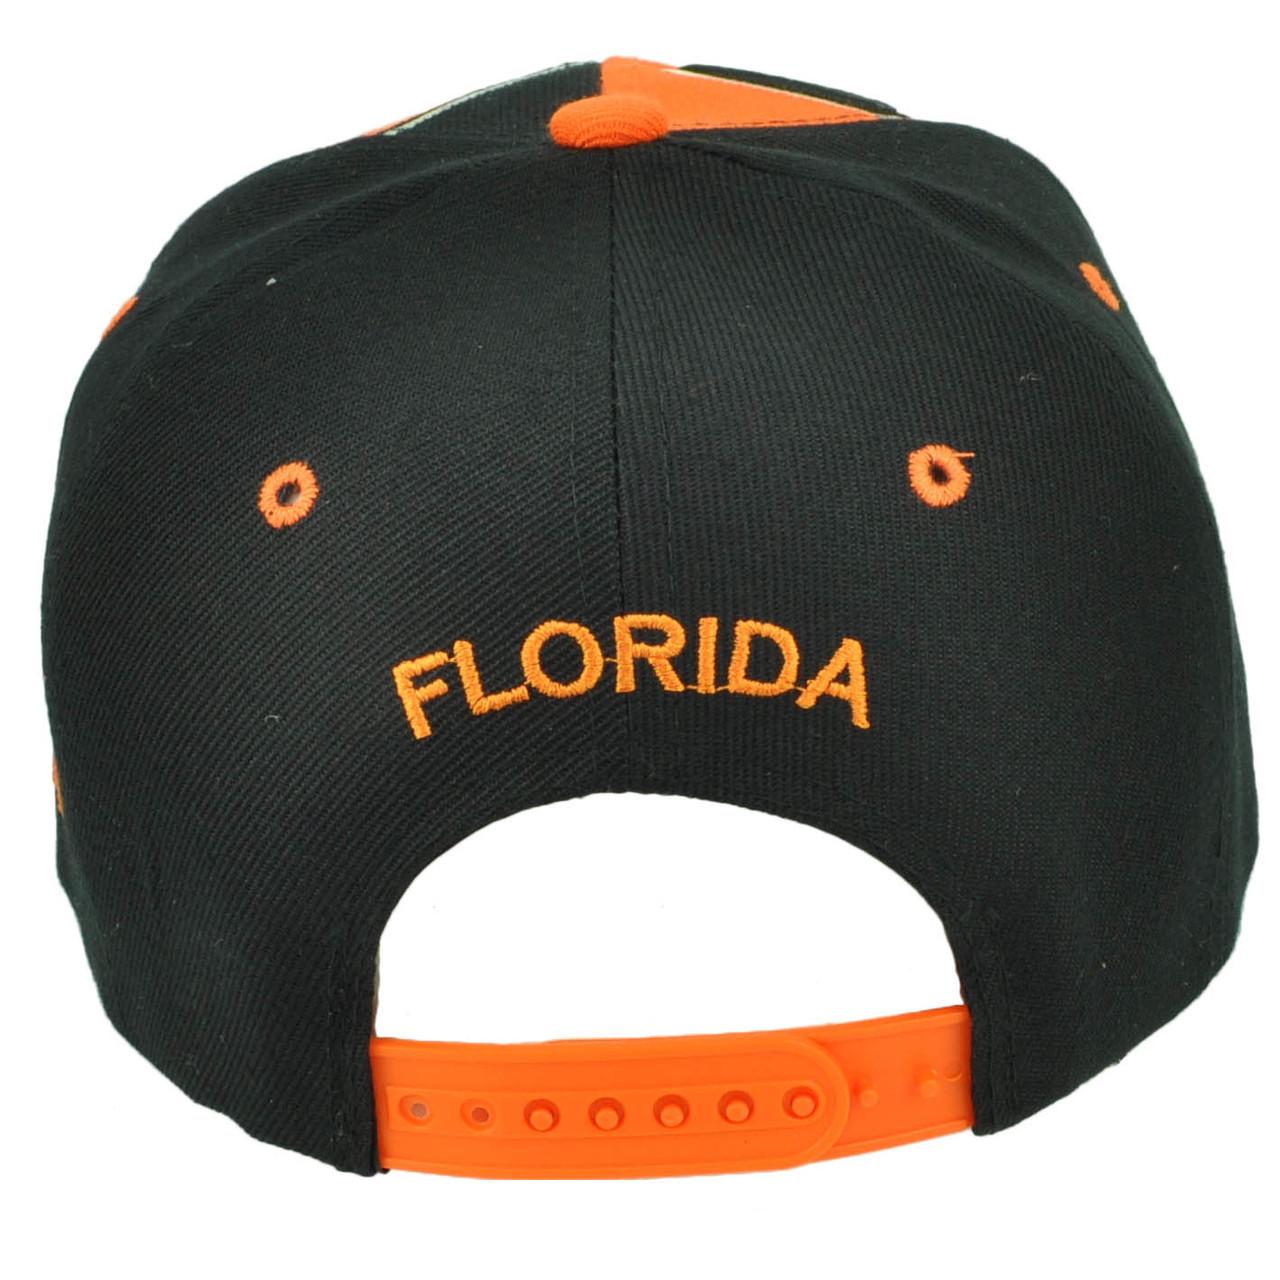 Florida FL Sunshine State Navy Blue Snapback Flat Bill Hat Cap USA Adjustable